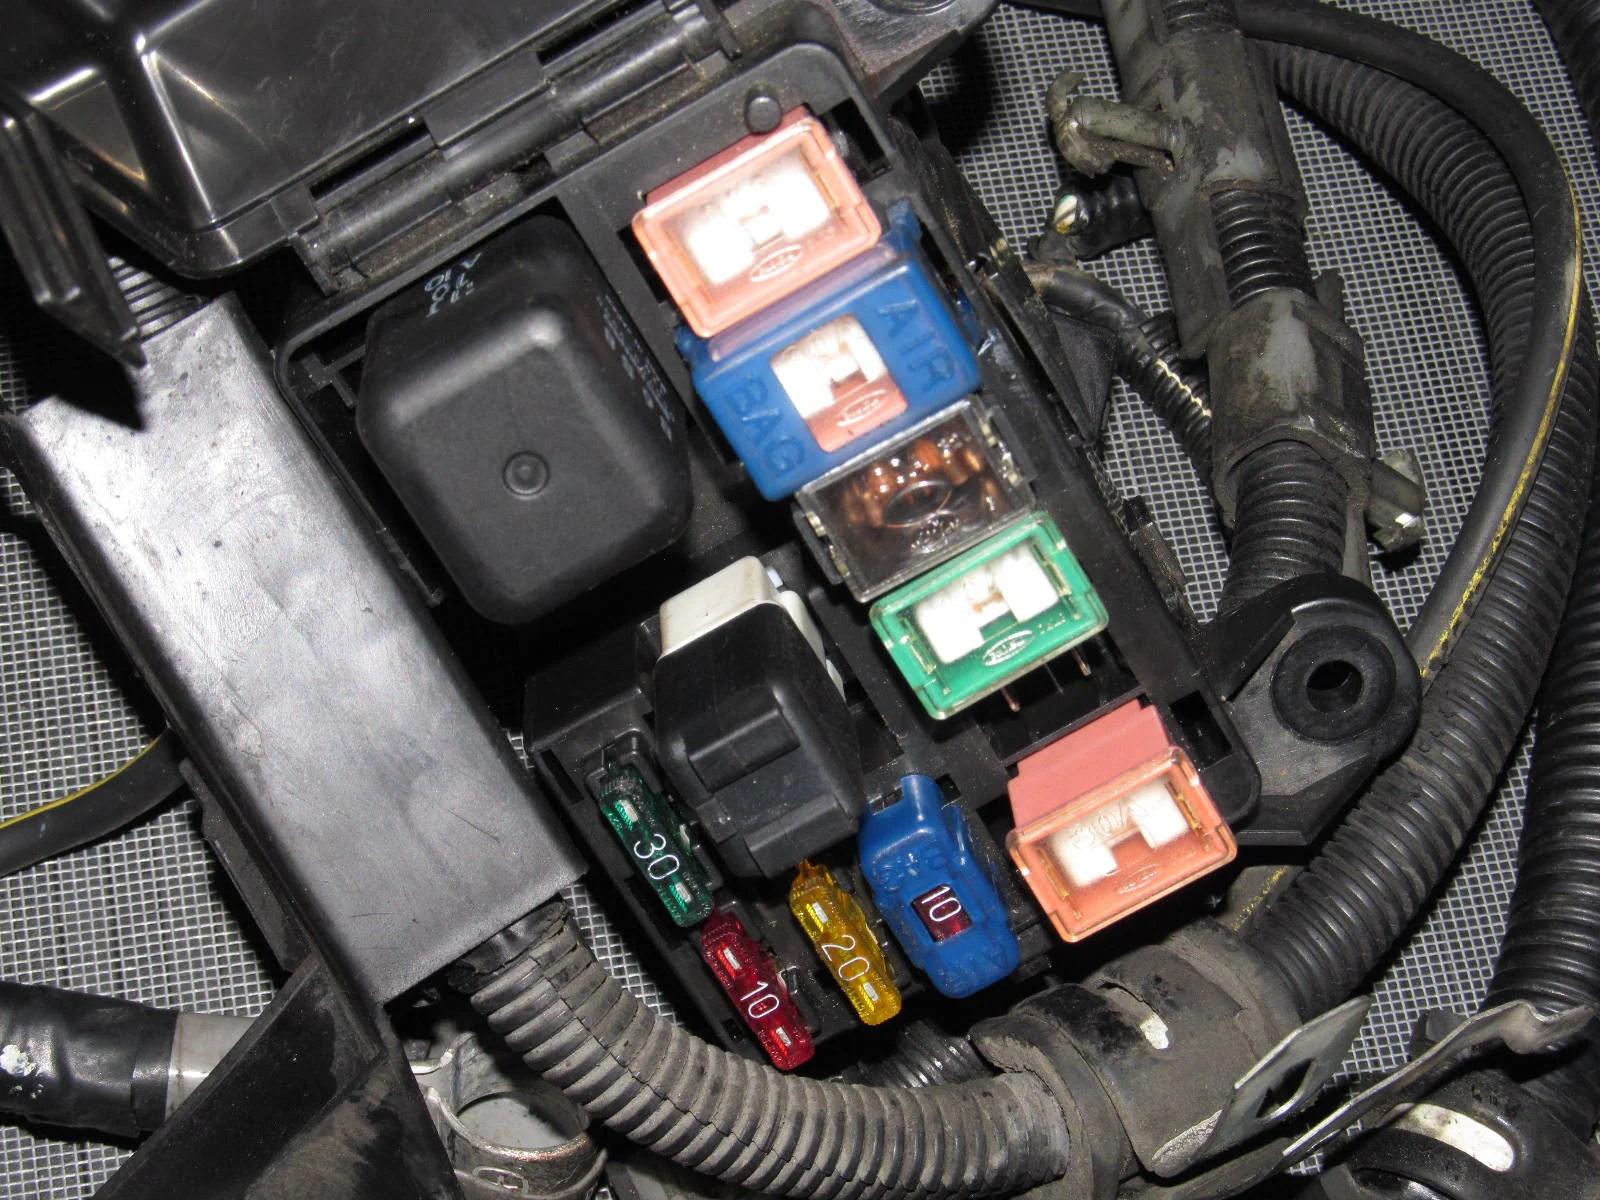 medium resolution of 91 mazda miata fuse box wiring diagram technic91 mazda miata fuse box 17